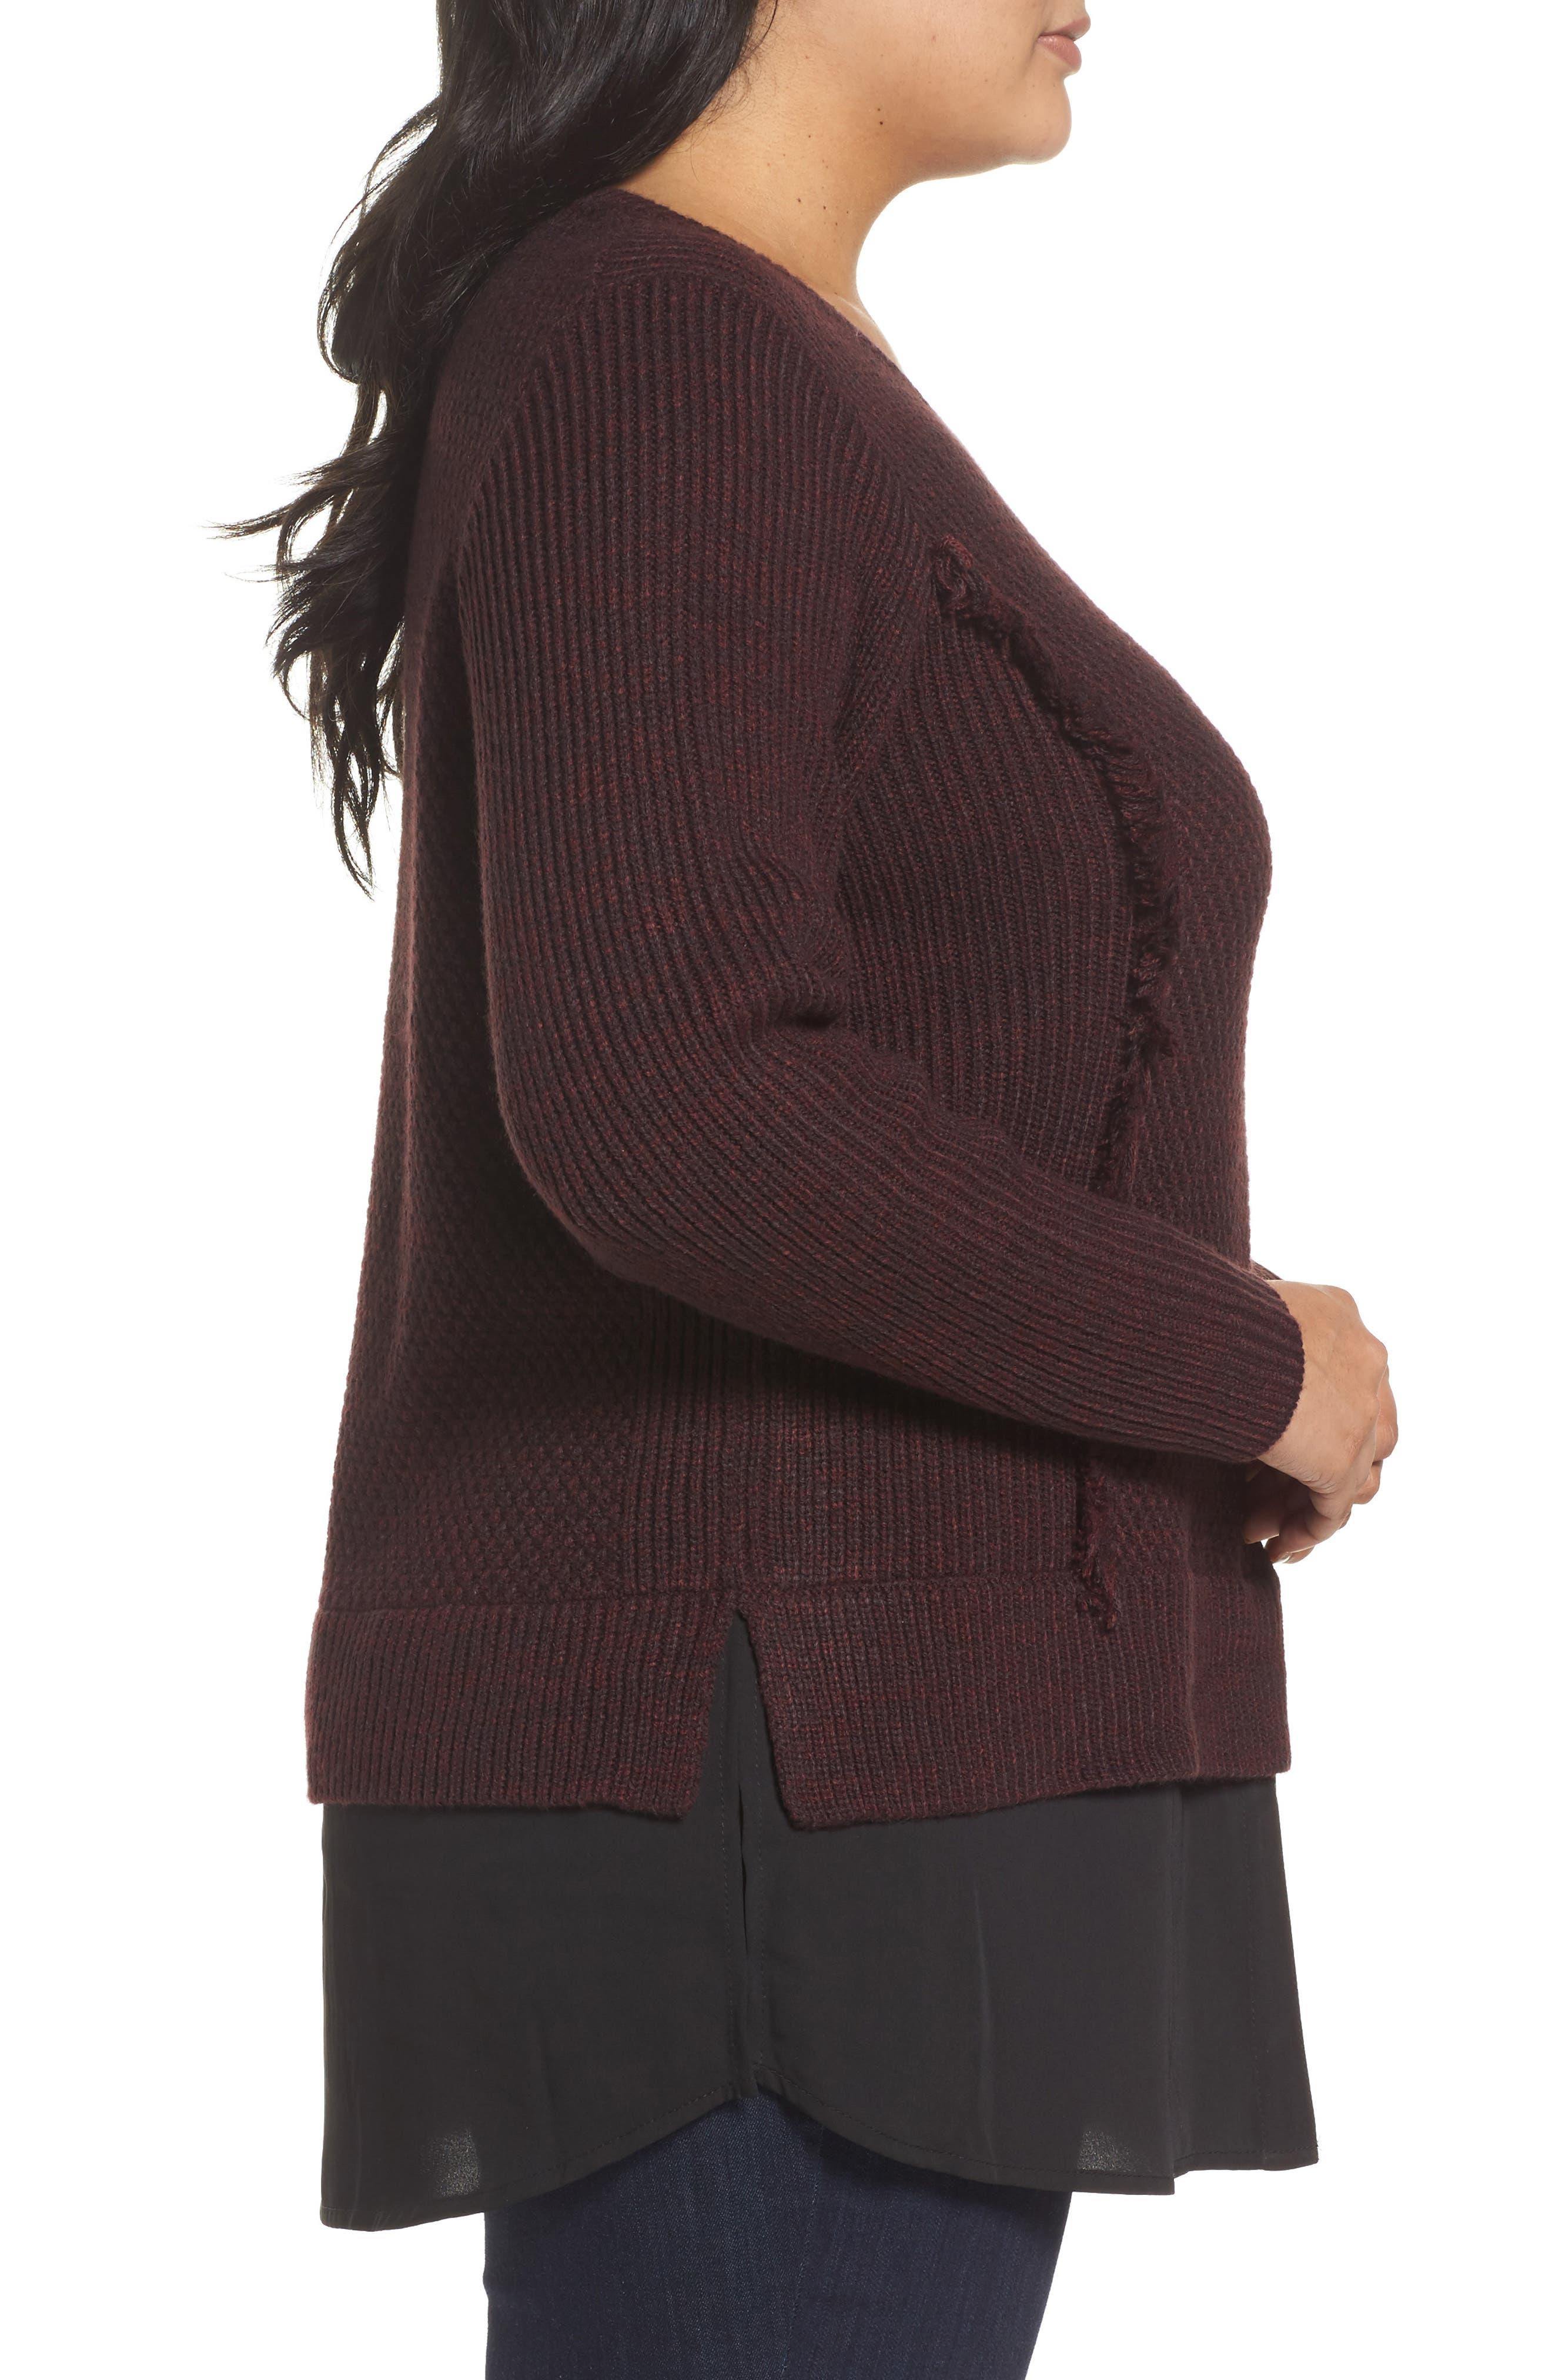 Sophia Layered Look Sweater,                             Alternate thumbnail 3, color,                             606